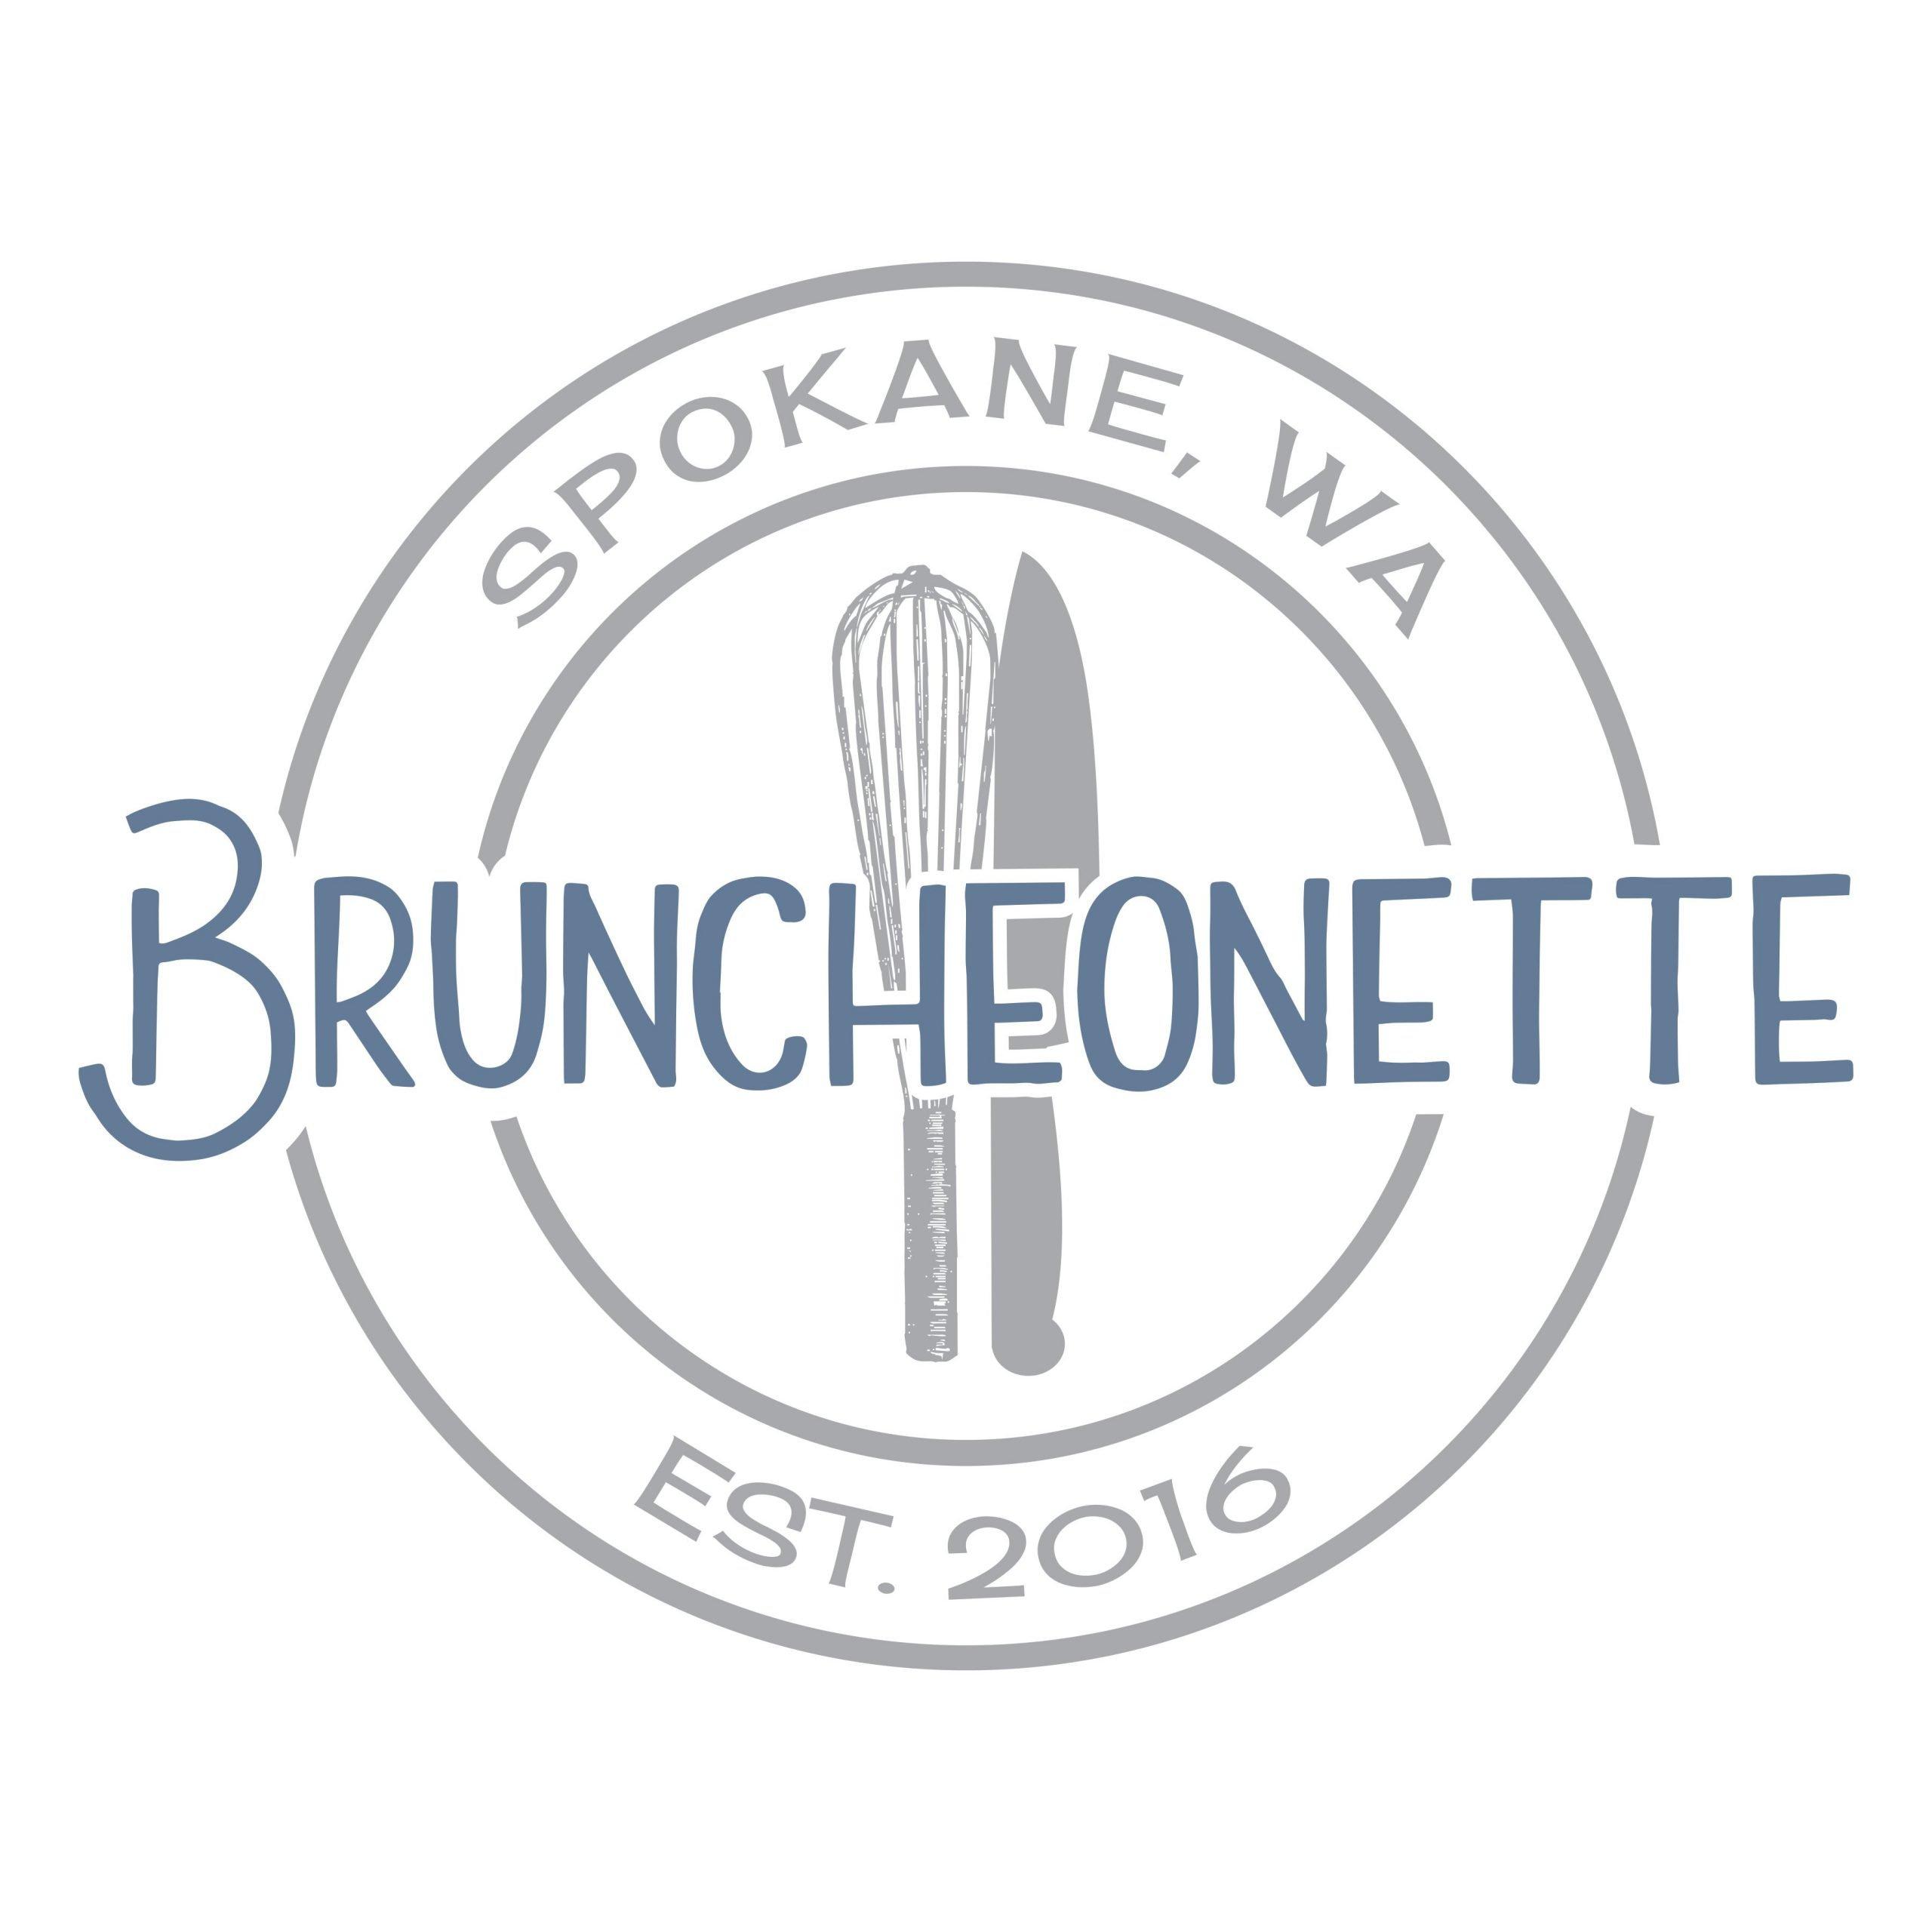 Bruncheonette Spokane